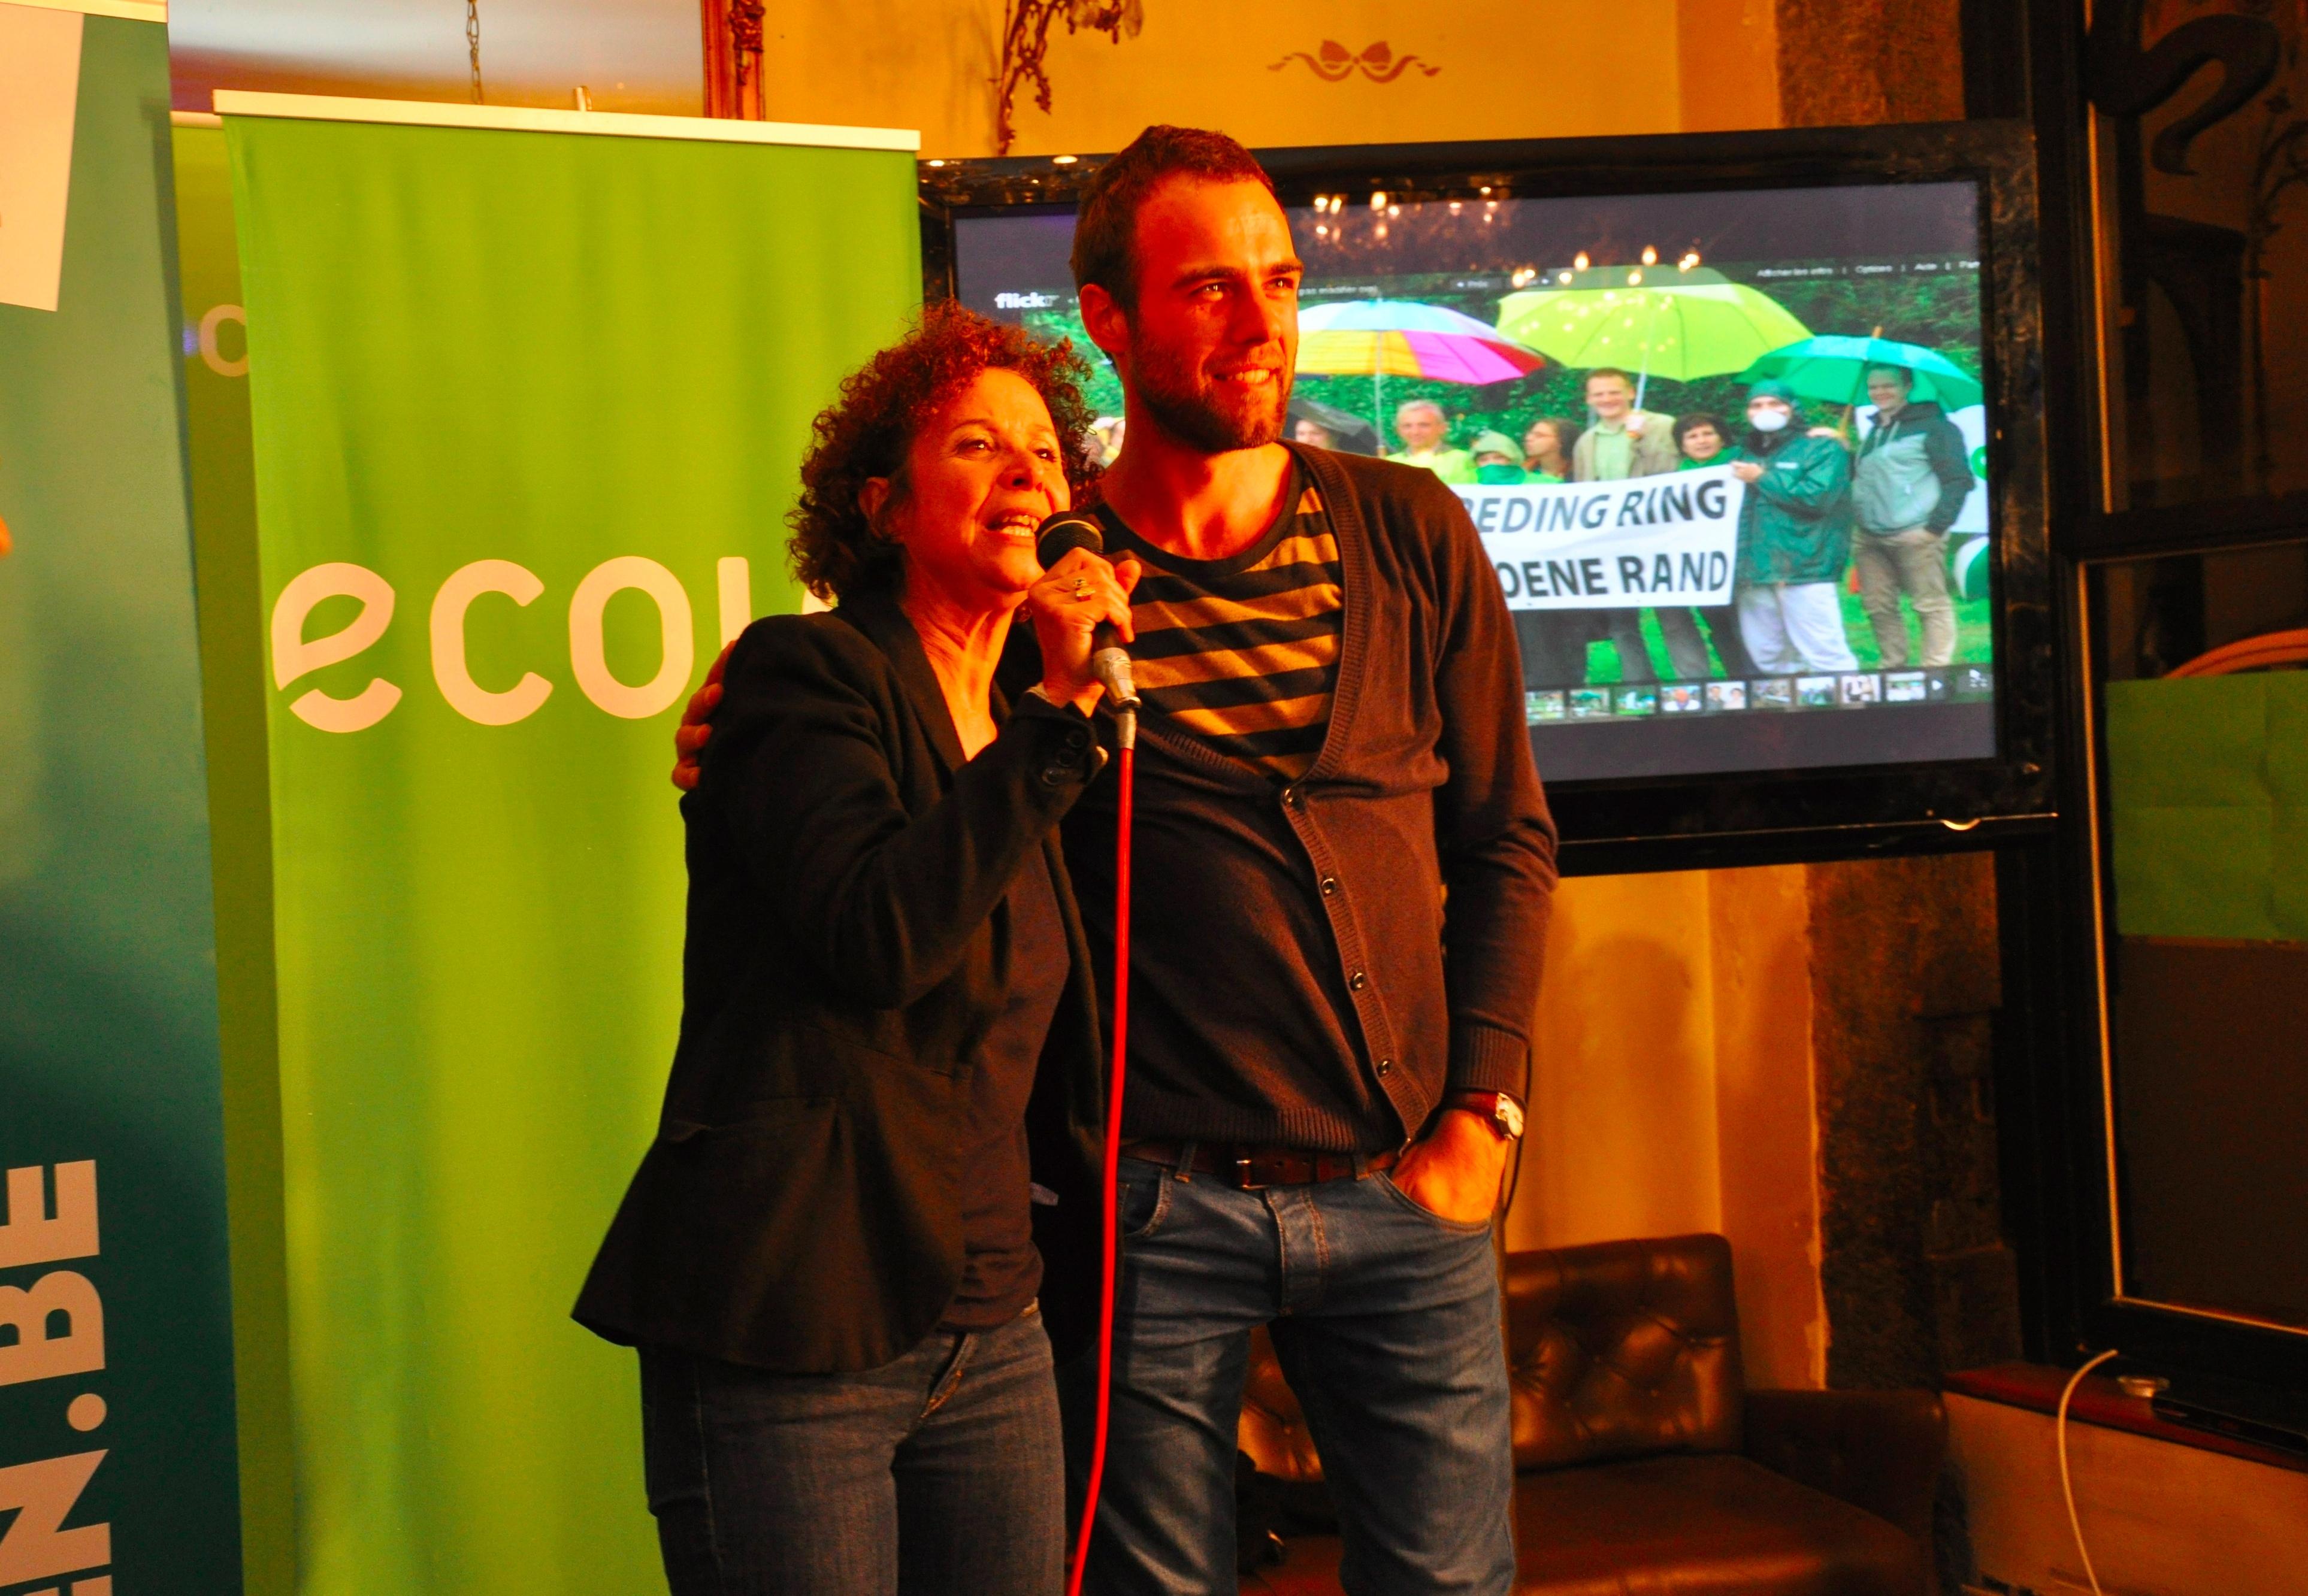 Bart D'Hondt 121014 en Marie Nagy op verkiezingsavond Ecolo-Groen – Foto H.Sleebus DSC_0986ckl2